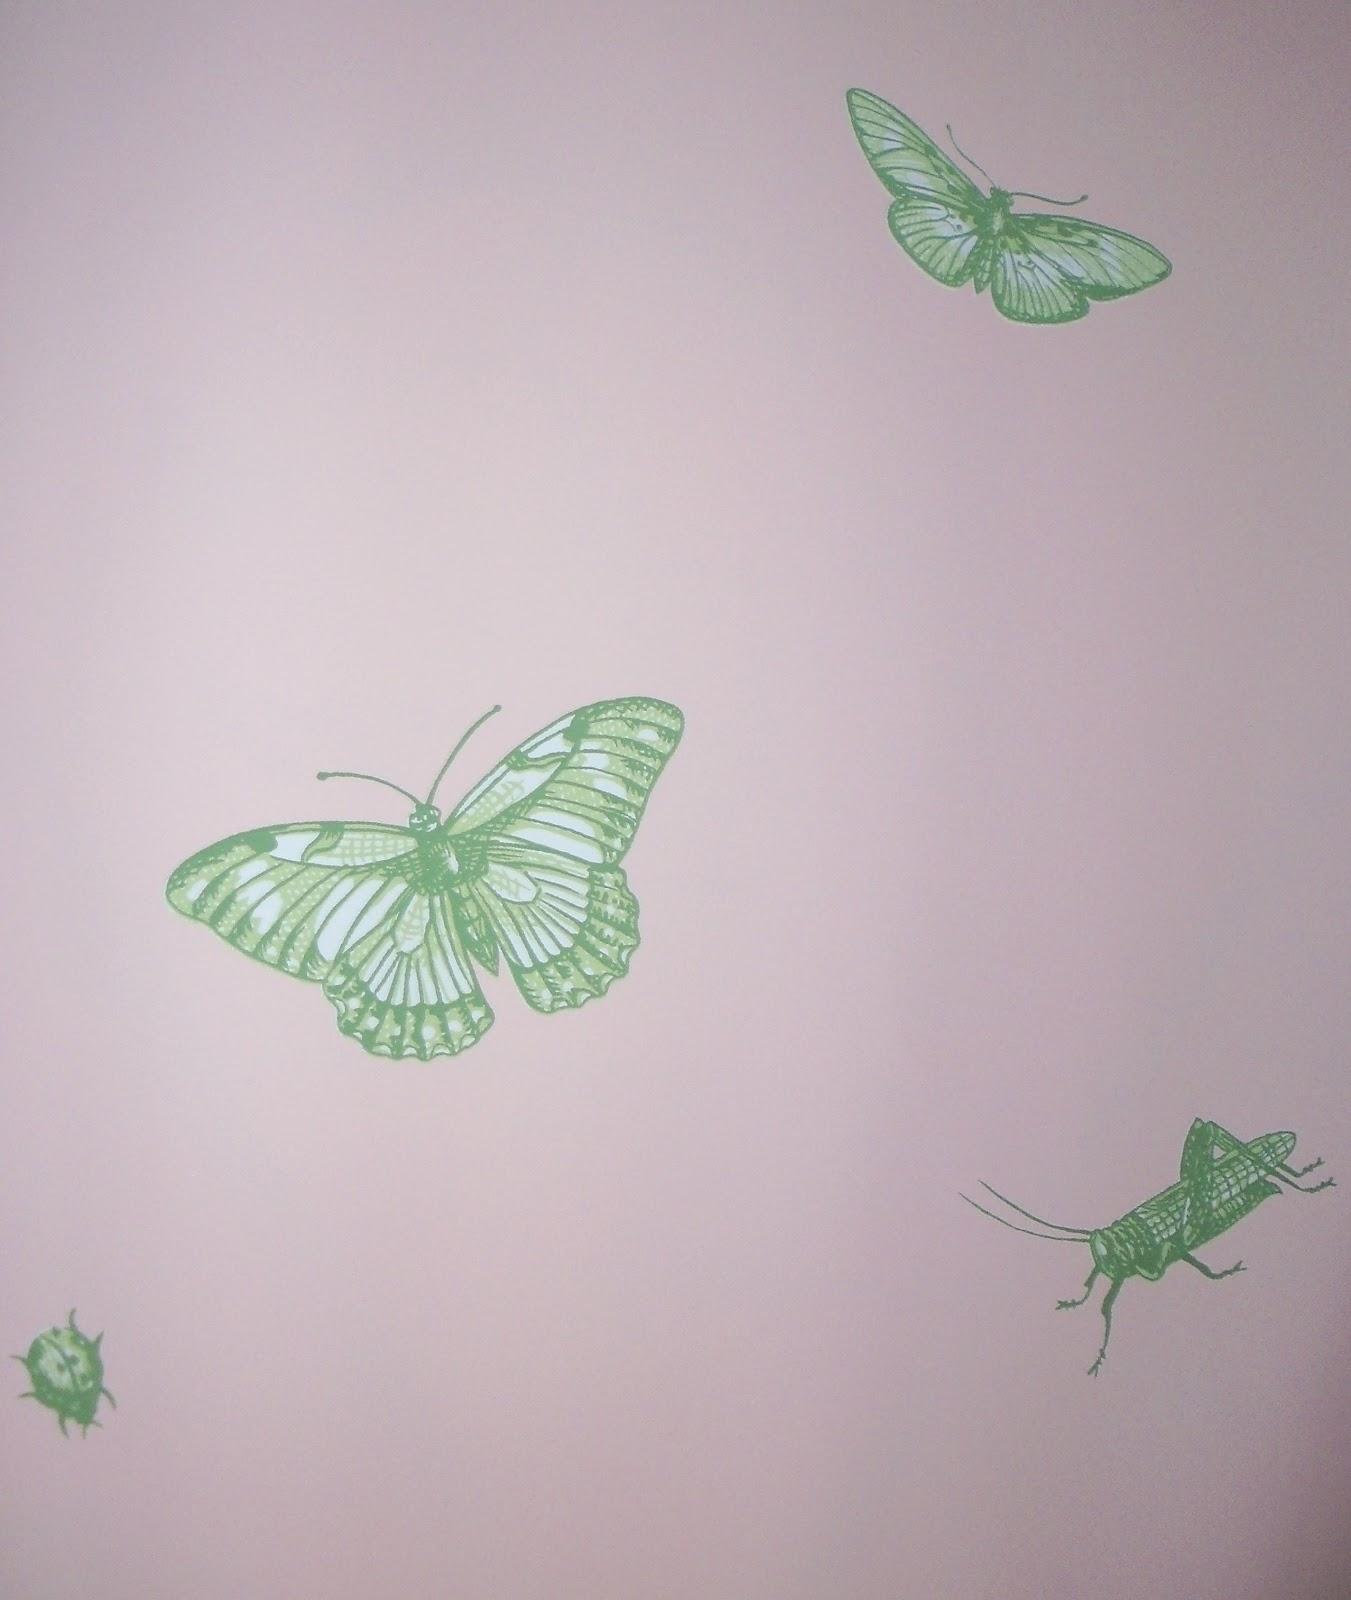 http://1.bp.blogspot.com/-0gfDUm-4Jhw/UA6KA9D_zRI/AAAAAAAABkM/fmdAF2iOtNE/s1600/18+Thibaut+Ladybug+Pink.JPG